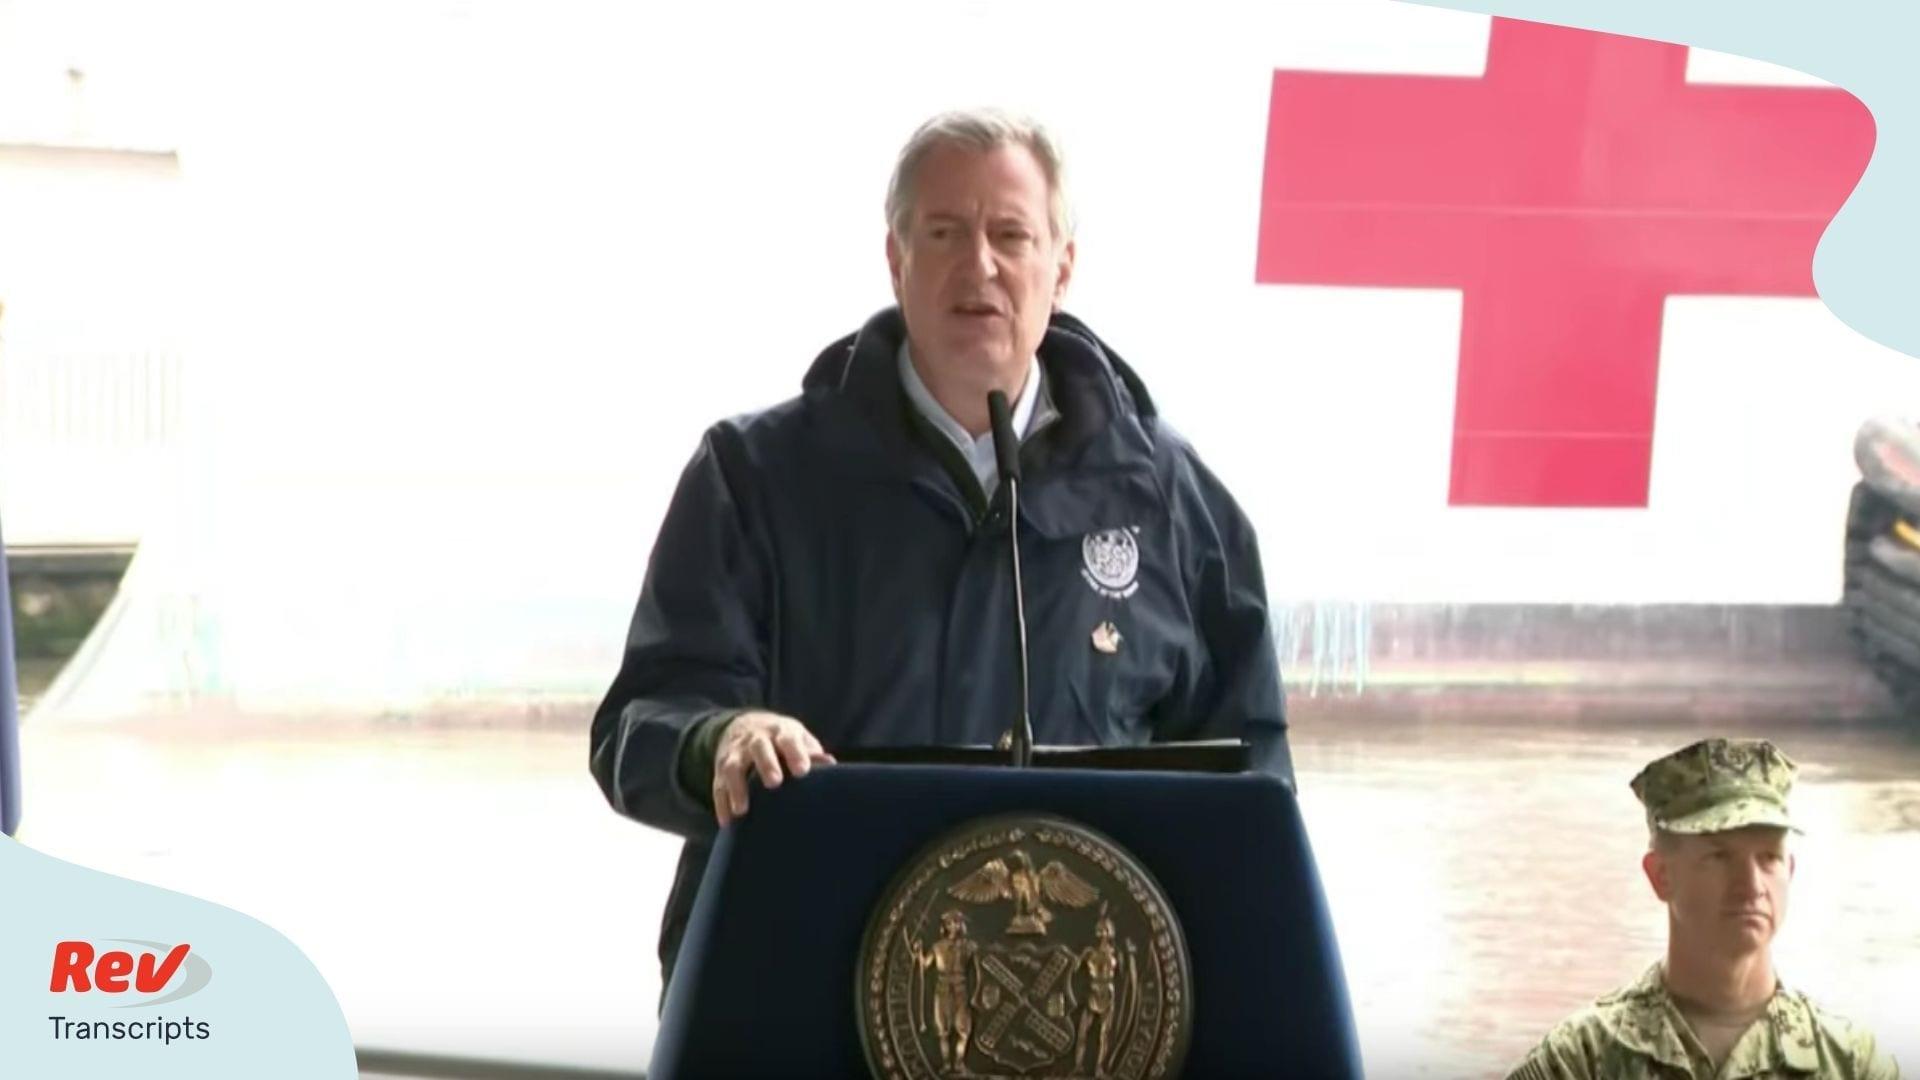 Bill de Blasio New York City Update March 30